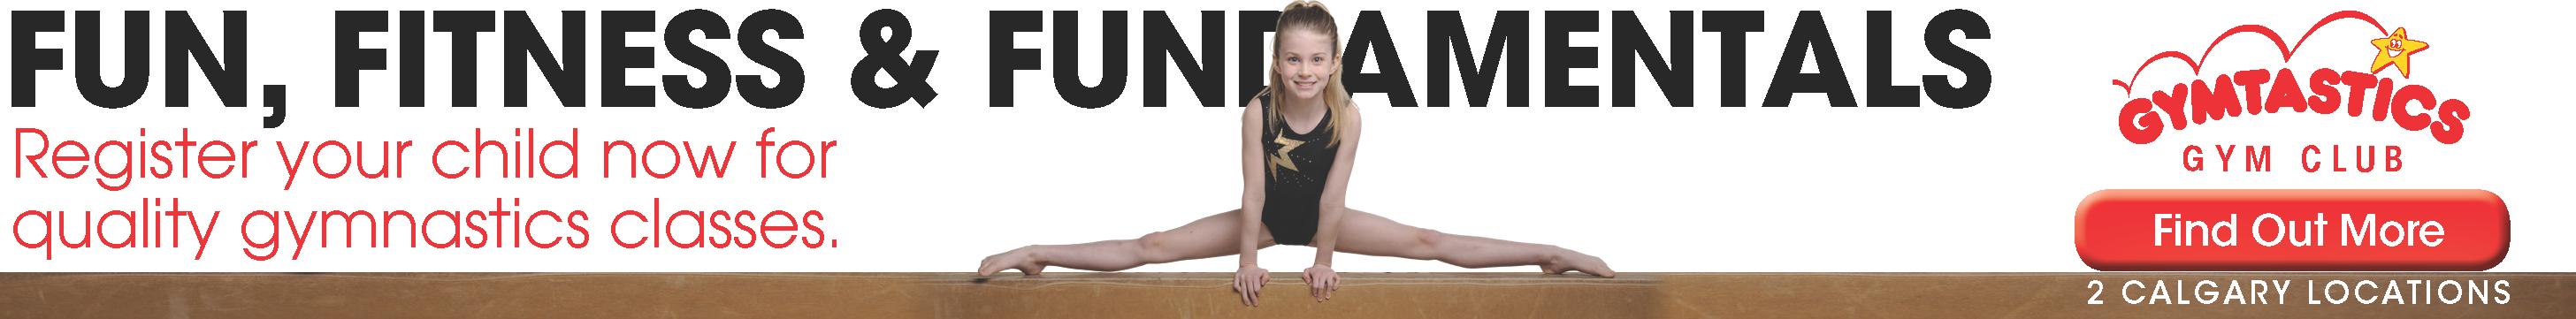 Gymnastics Dec 2018